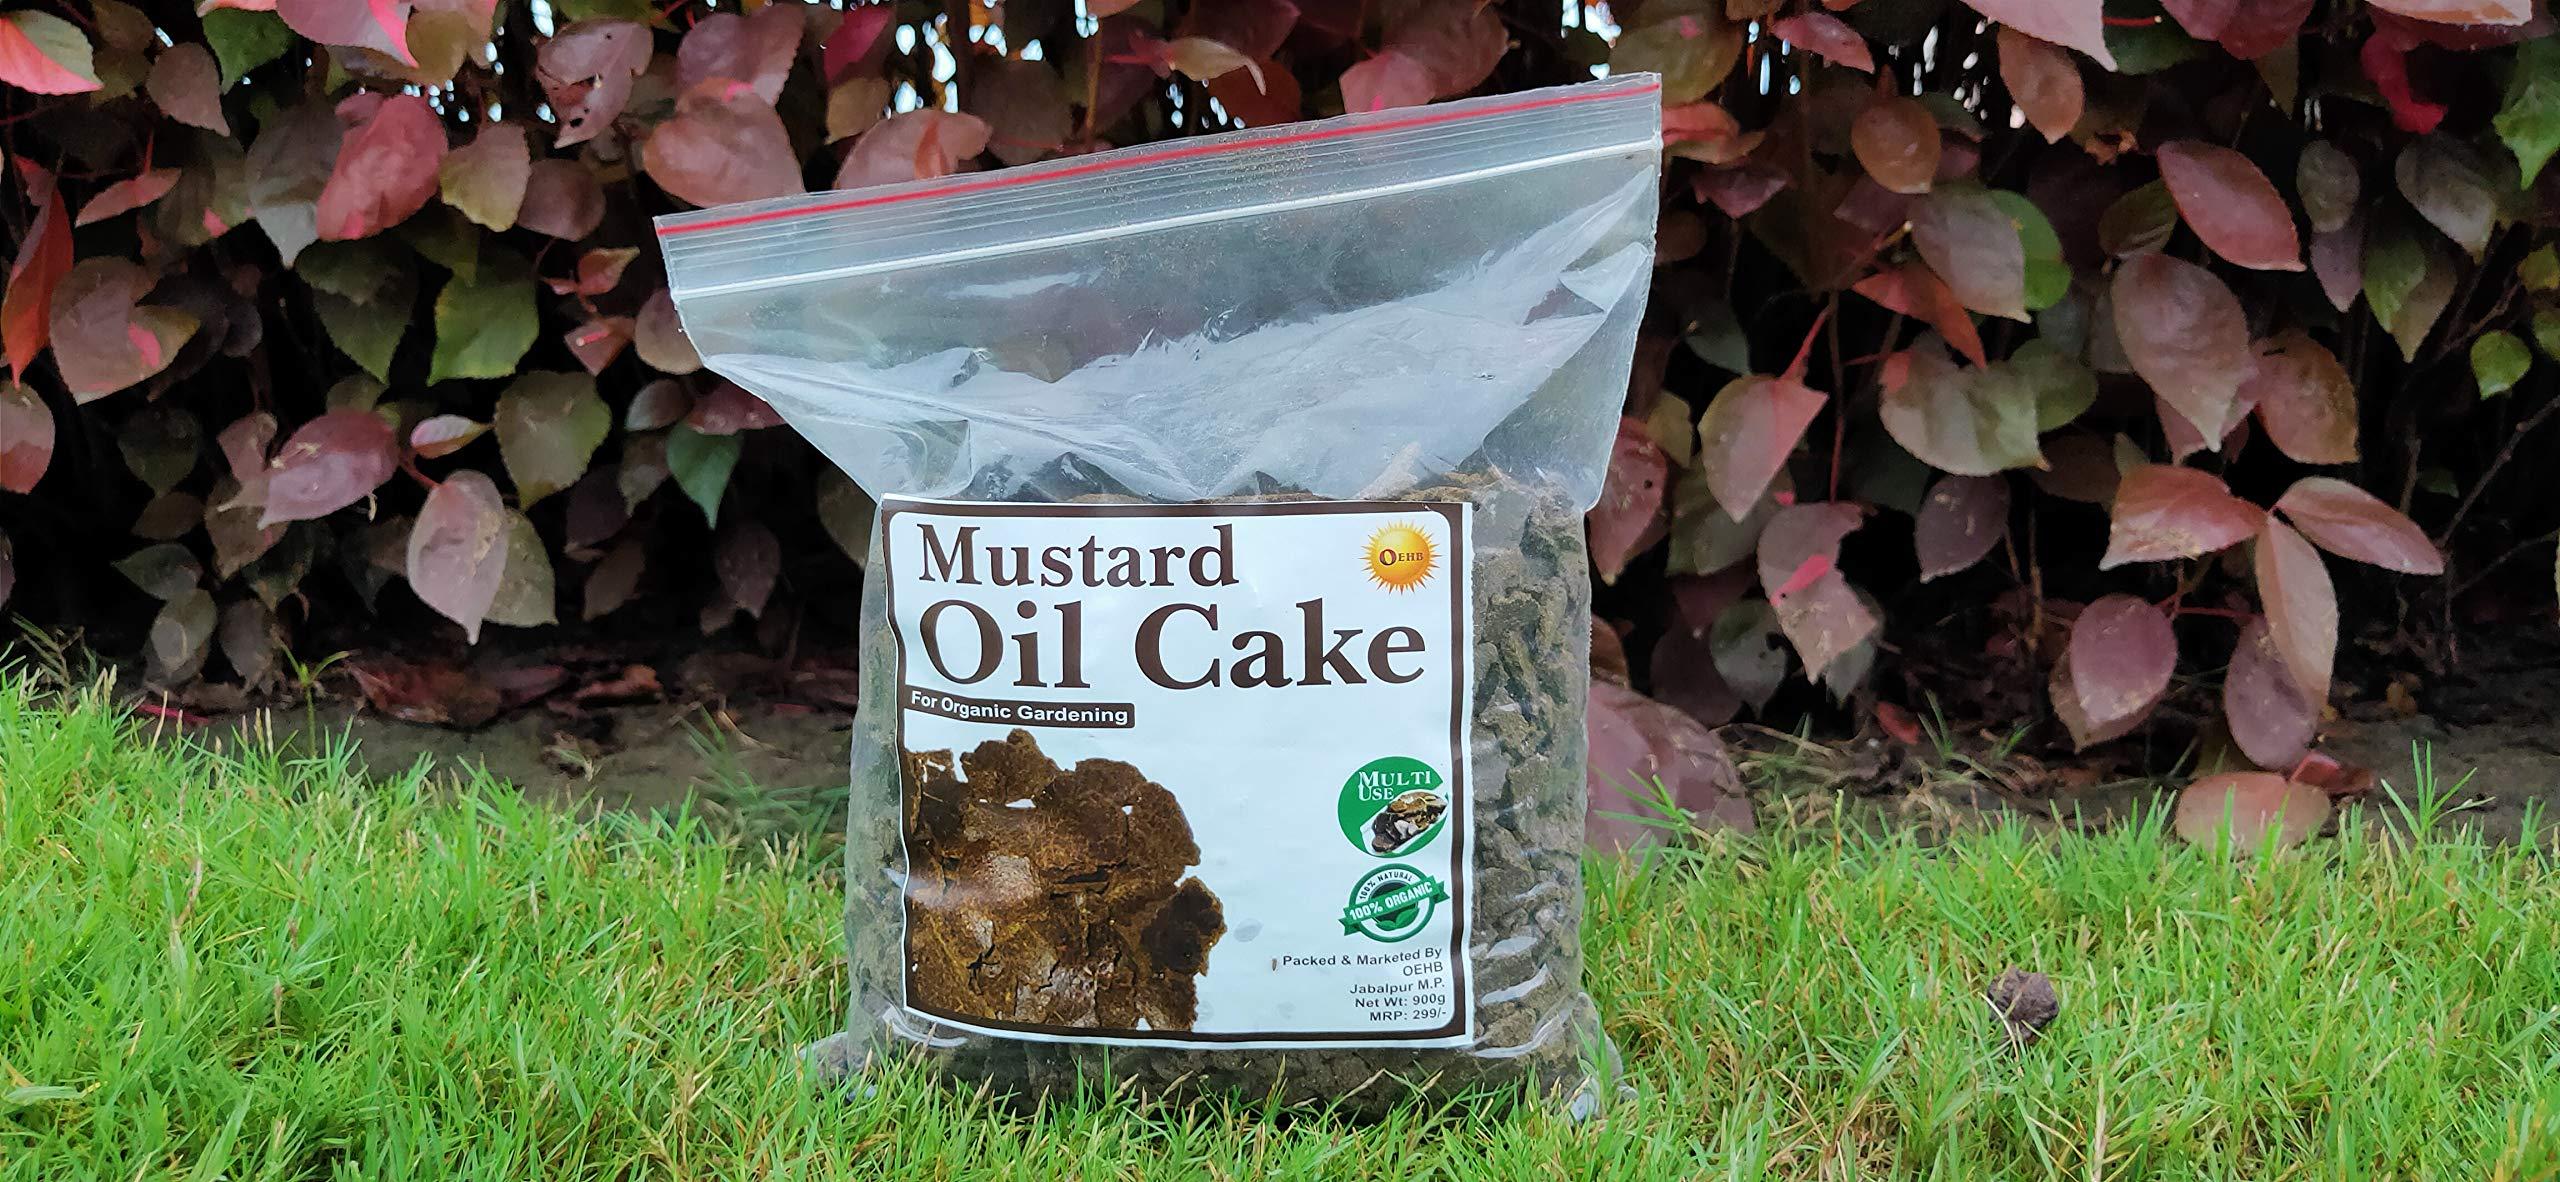 Generic Mustard Cake Fertilizer for Plants Growth, 900G